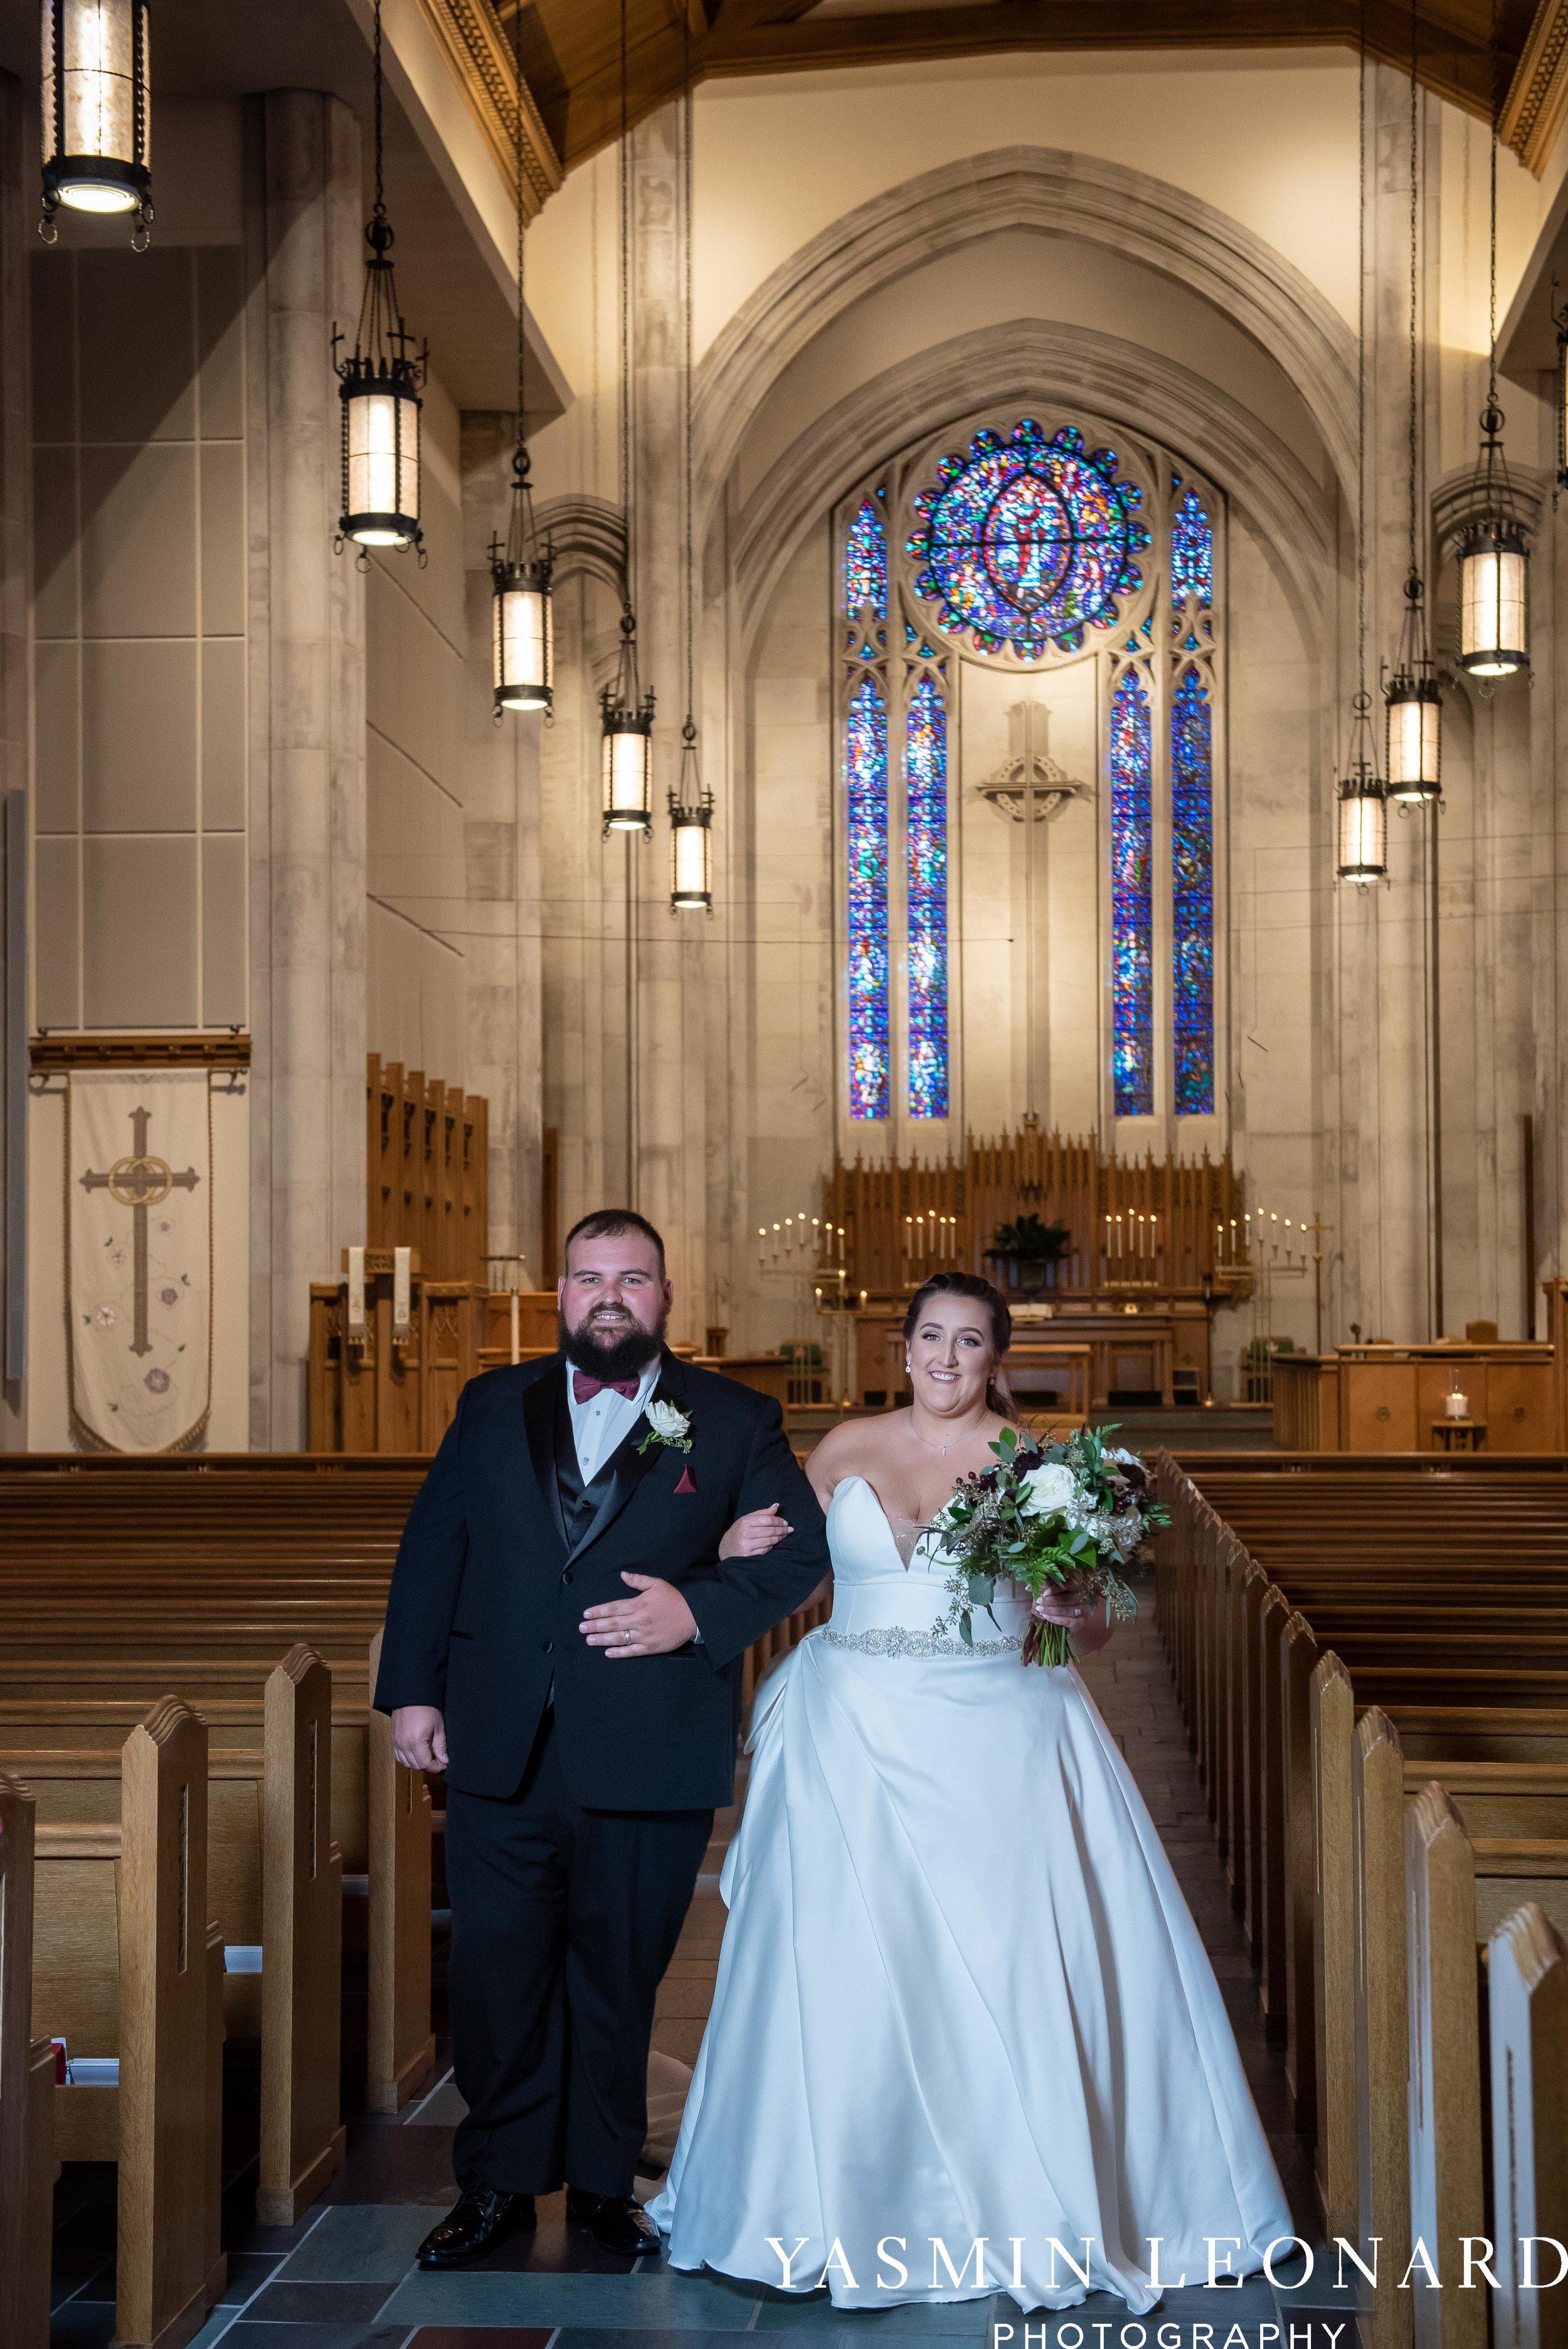 Wesley Memorial United Methodist Church - Old Homeplace Winery - High Point Weddings - High Point Wedding Photographer - NC Weddings - NC Barn Venue - Yasmin Leonard Photography-25.jpg